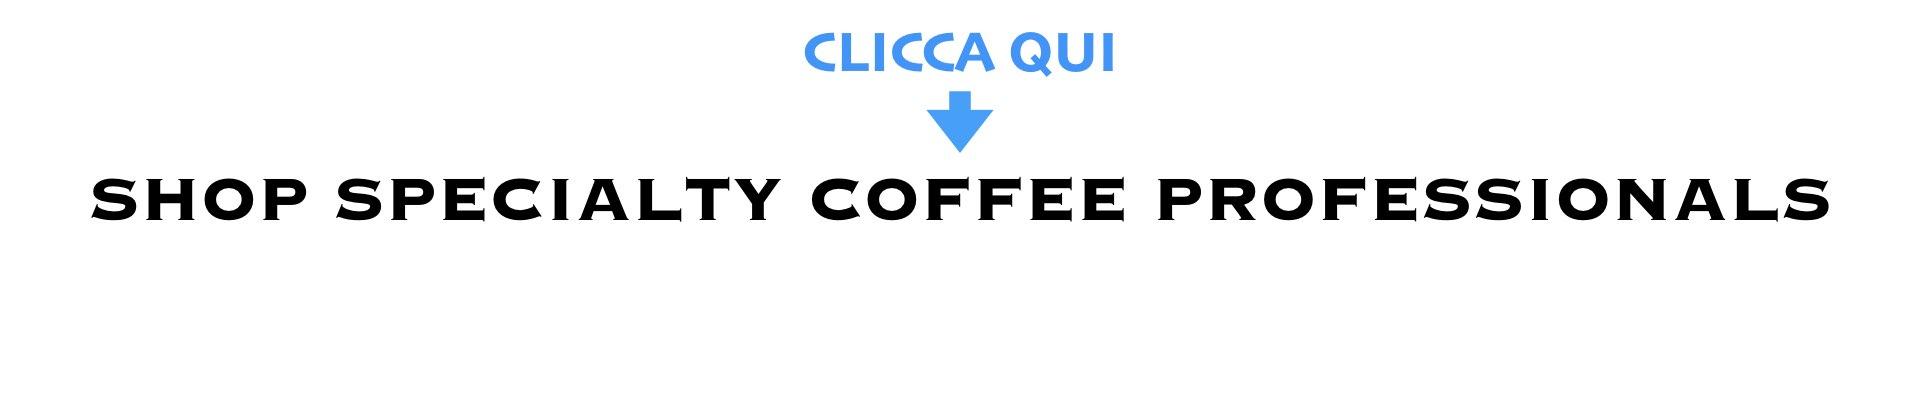 SHOP SPECIALTY COFFEE PROFESSIONALS